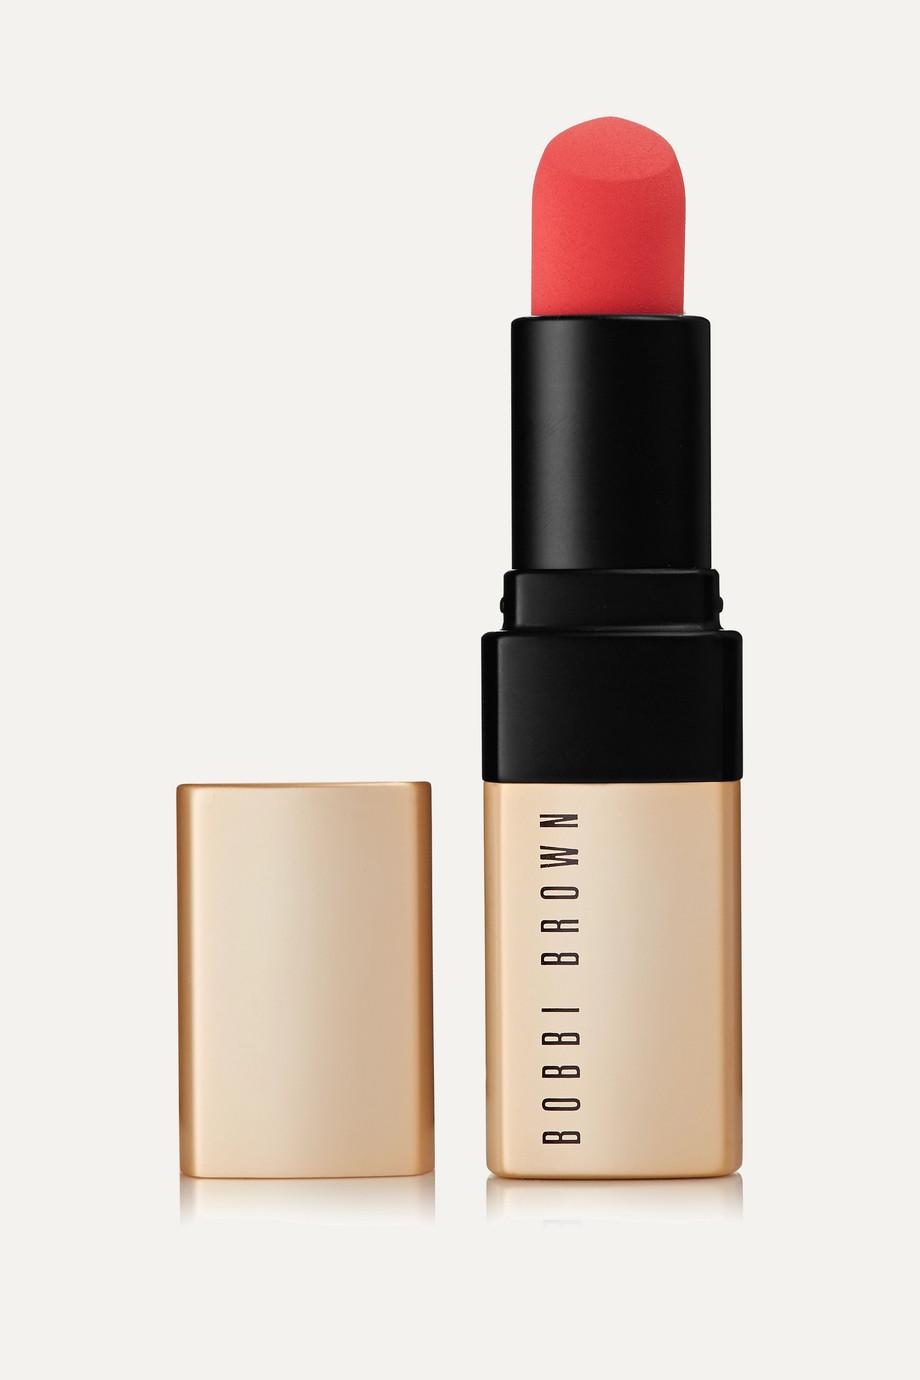 Bobbi Brown Luxe Matte Lip Color - Cheeky Peach